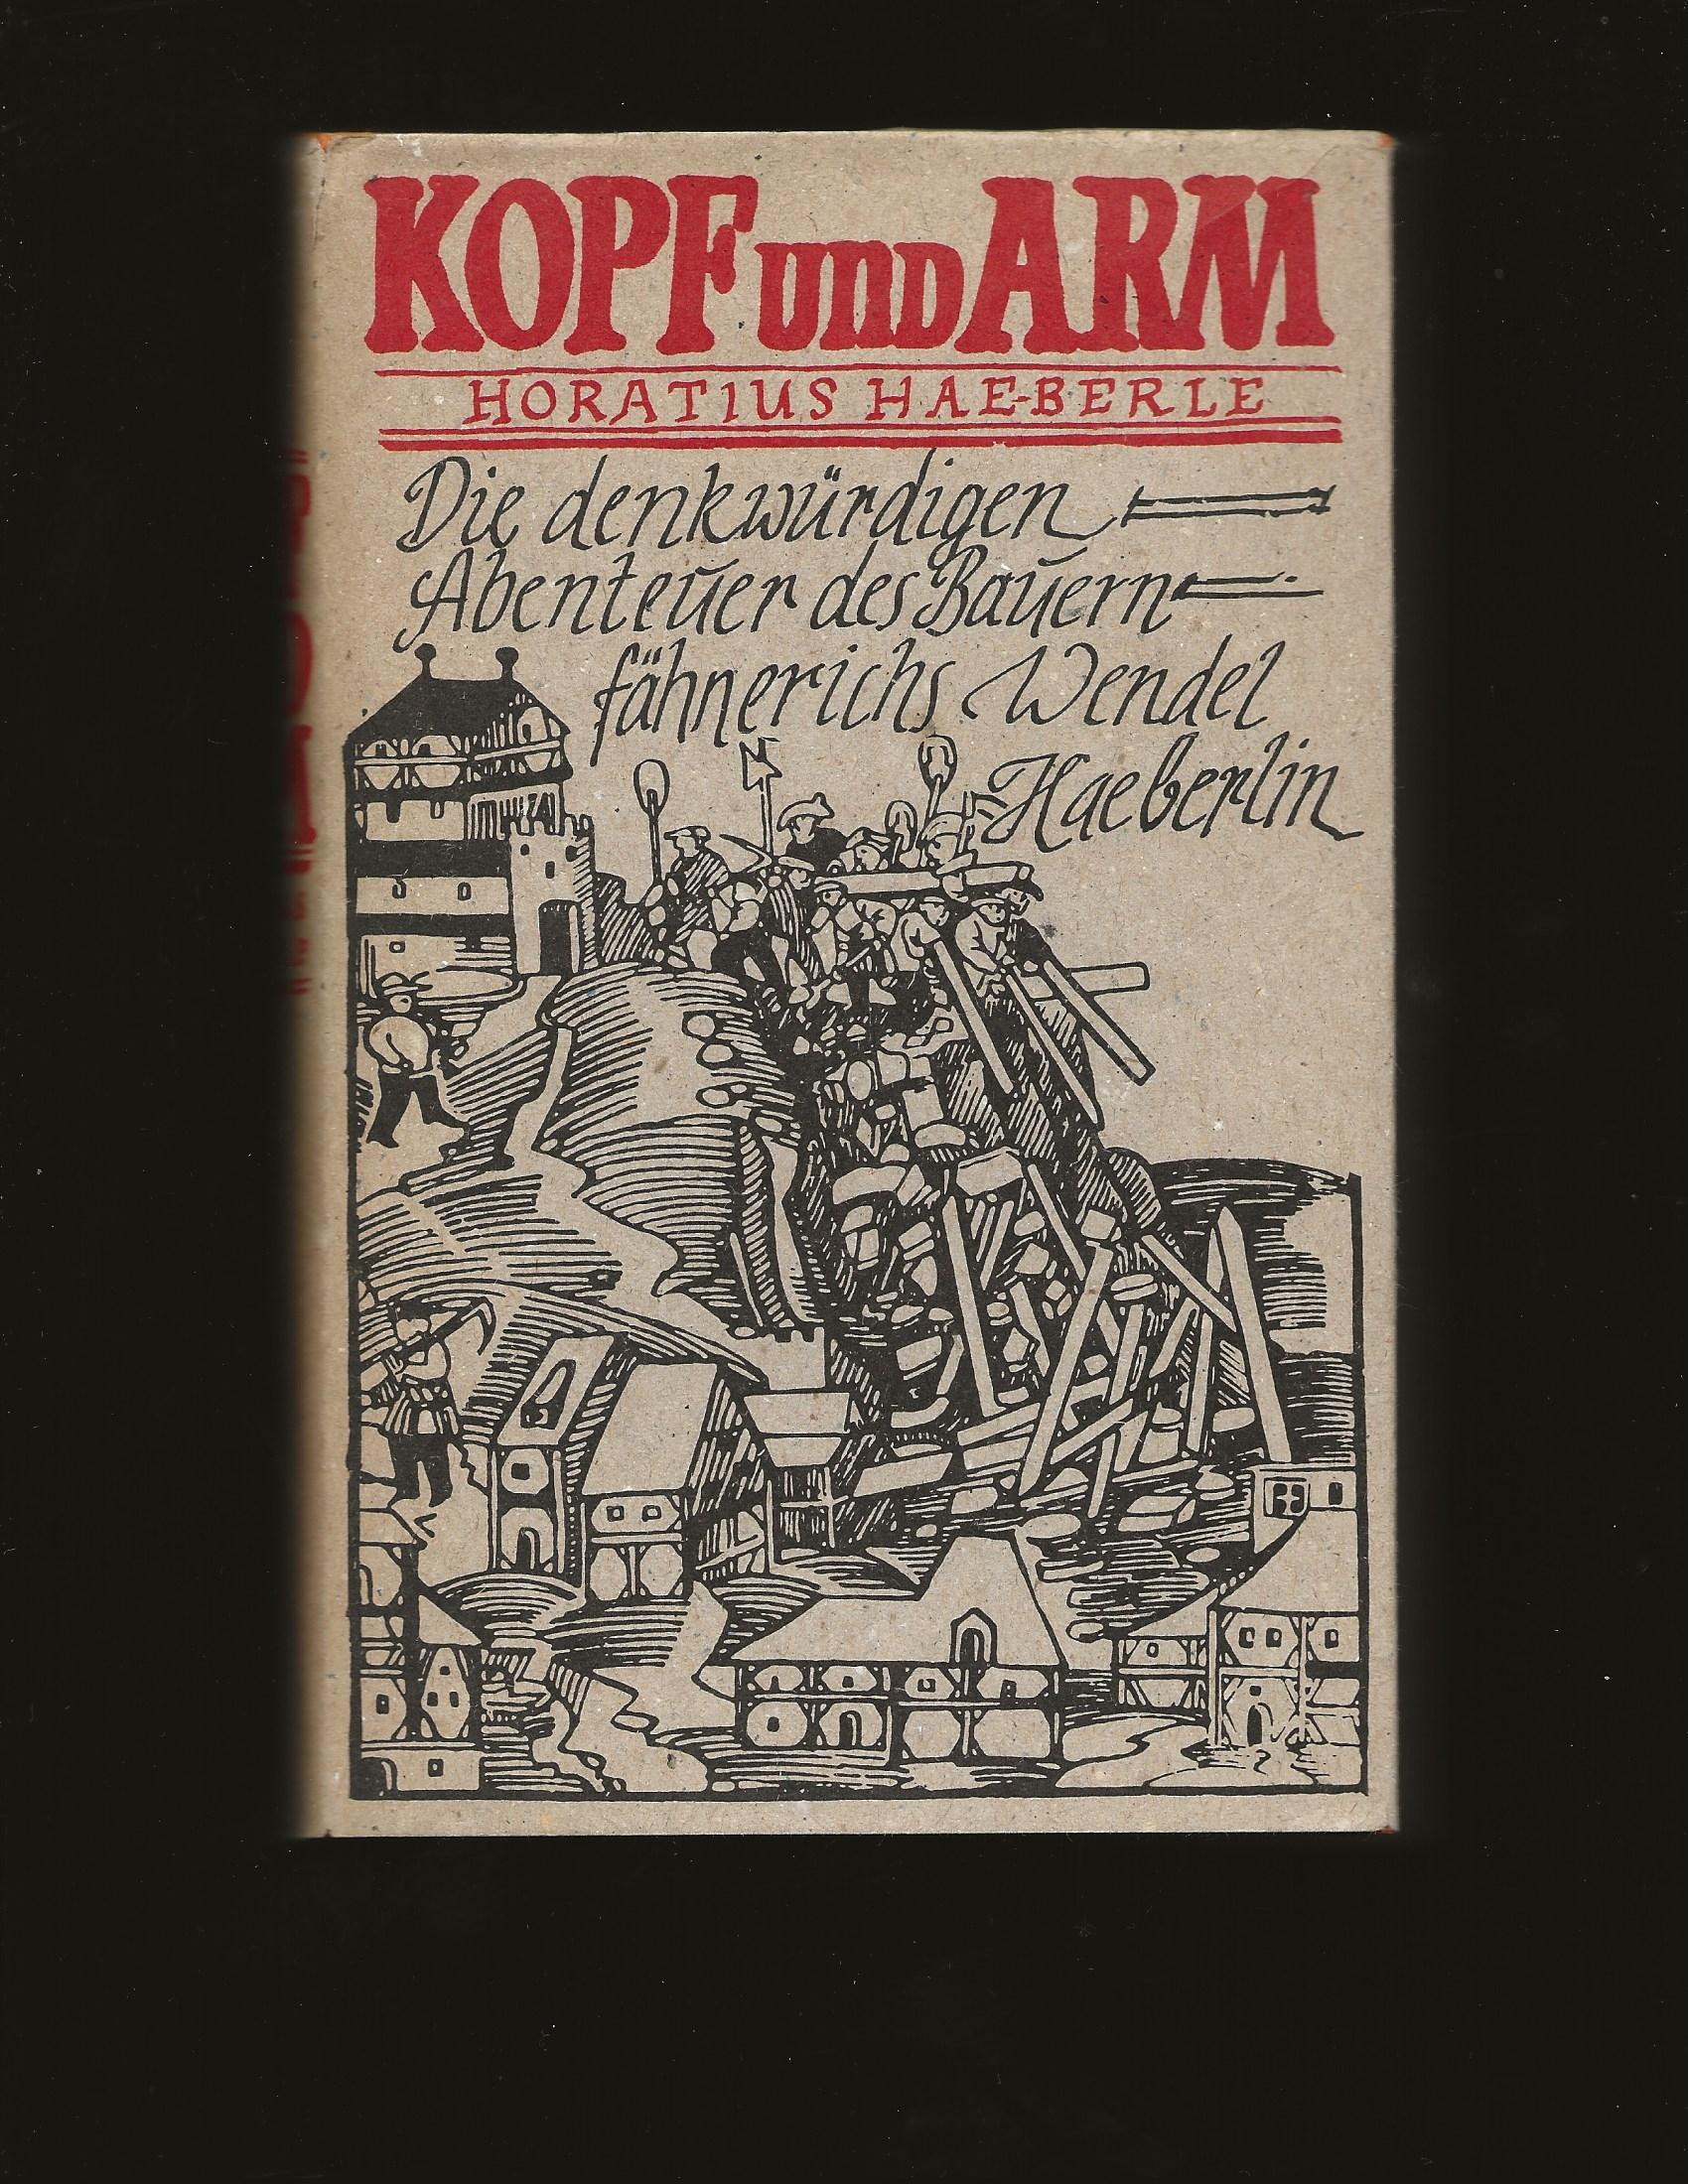 Kopf Und Arm: Die denkwurdigen Abenteuer d. Bauernfahnrichs-- Wendel Haeberlin (Only Signed Copy of Any of his books) (Inscribed to John J. McCloy) (German Edition) - Horatius Haeberle